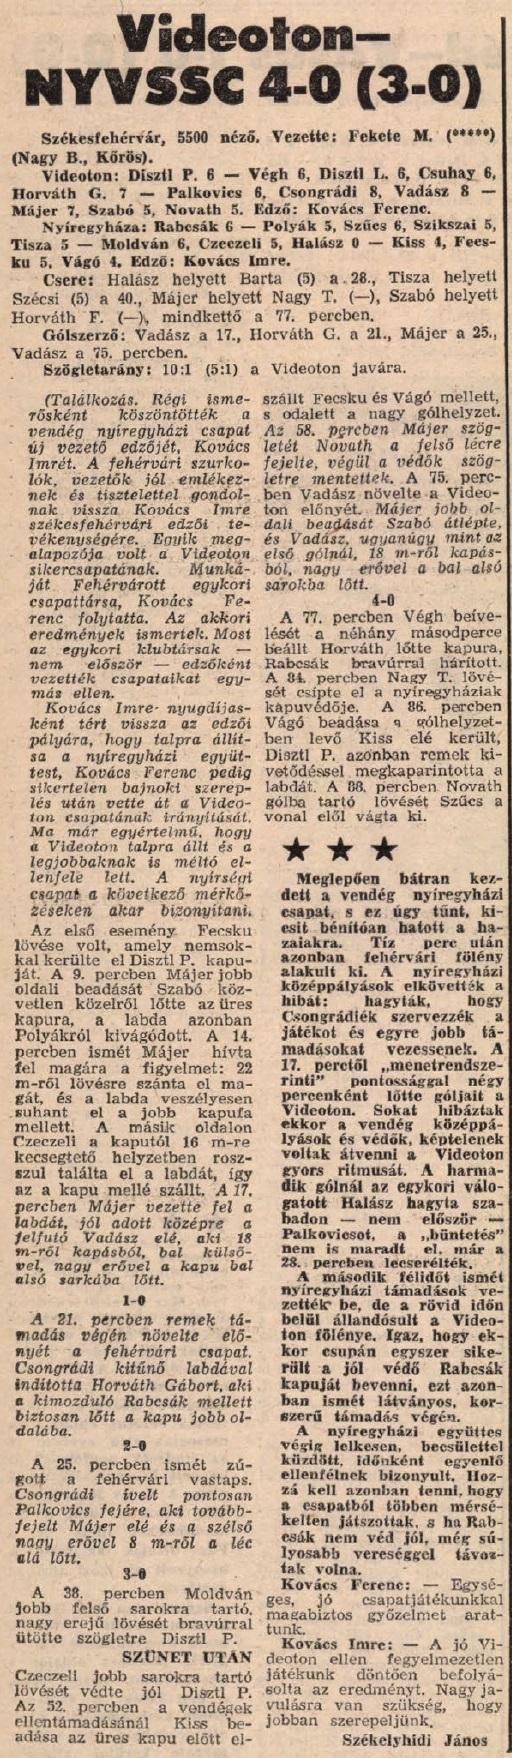 idokapszula_nb_i_1983_84_9_fordulo_videoton_nyiregyhaza.jpg